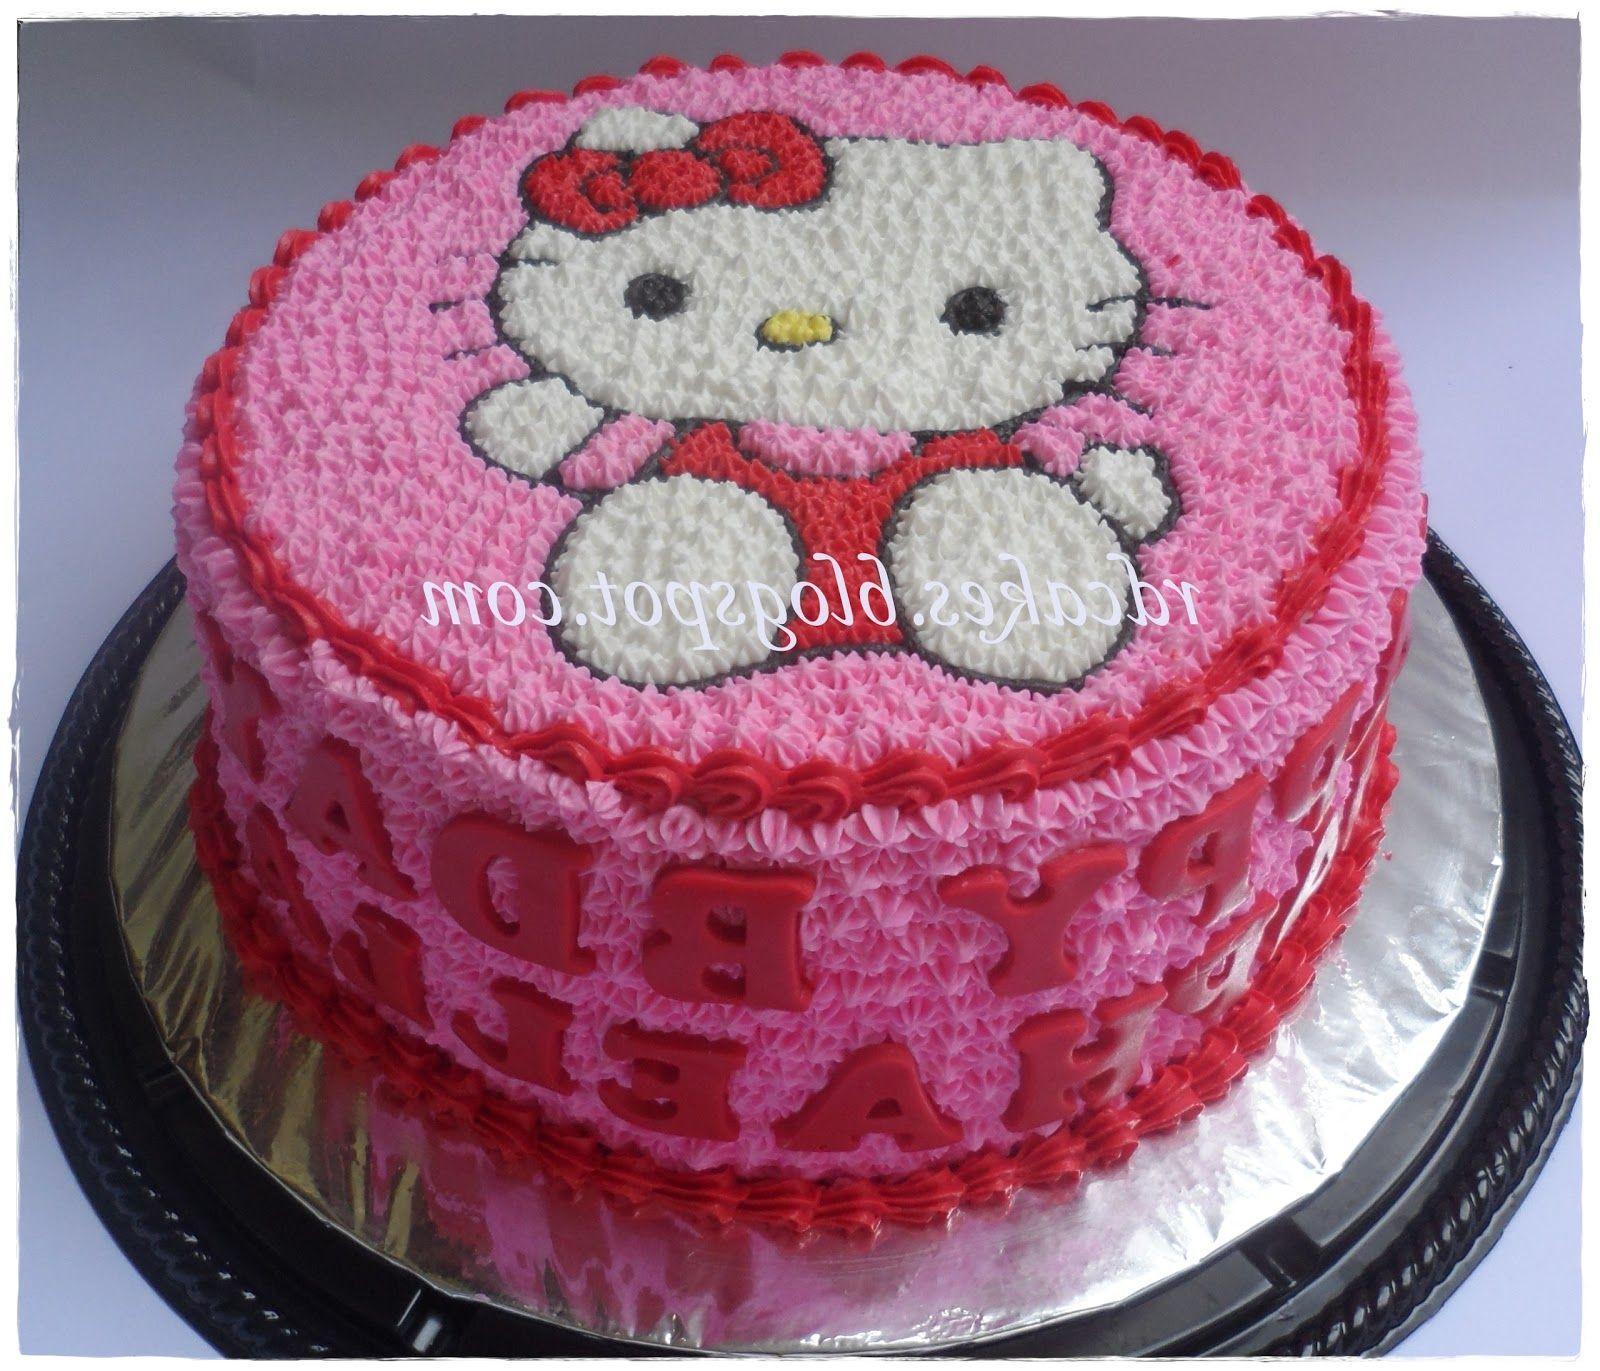 Cake Design Hello Kitty : Hello kitty buttercream cake cakes Pinterest Cake ...